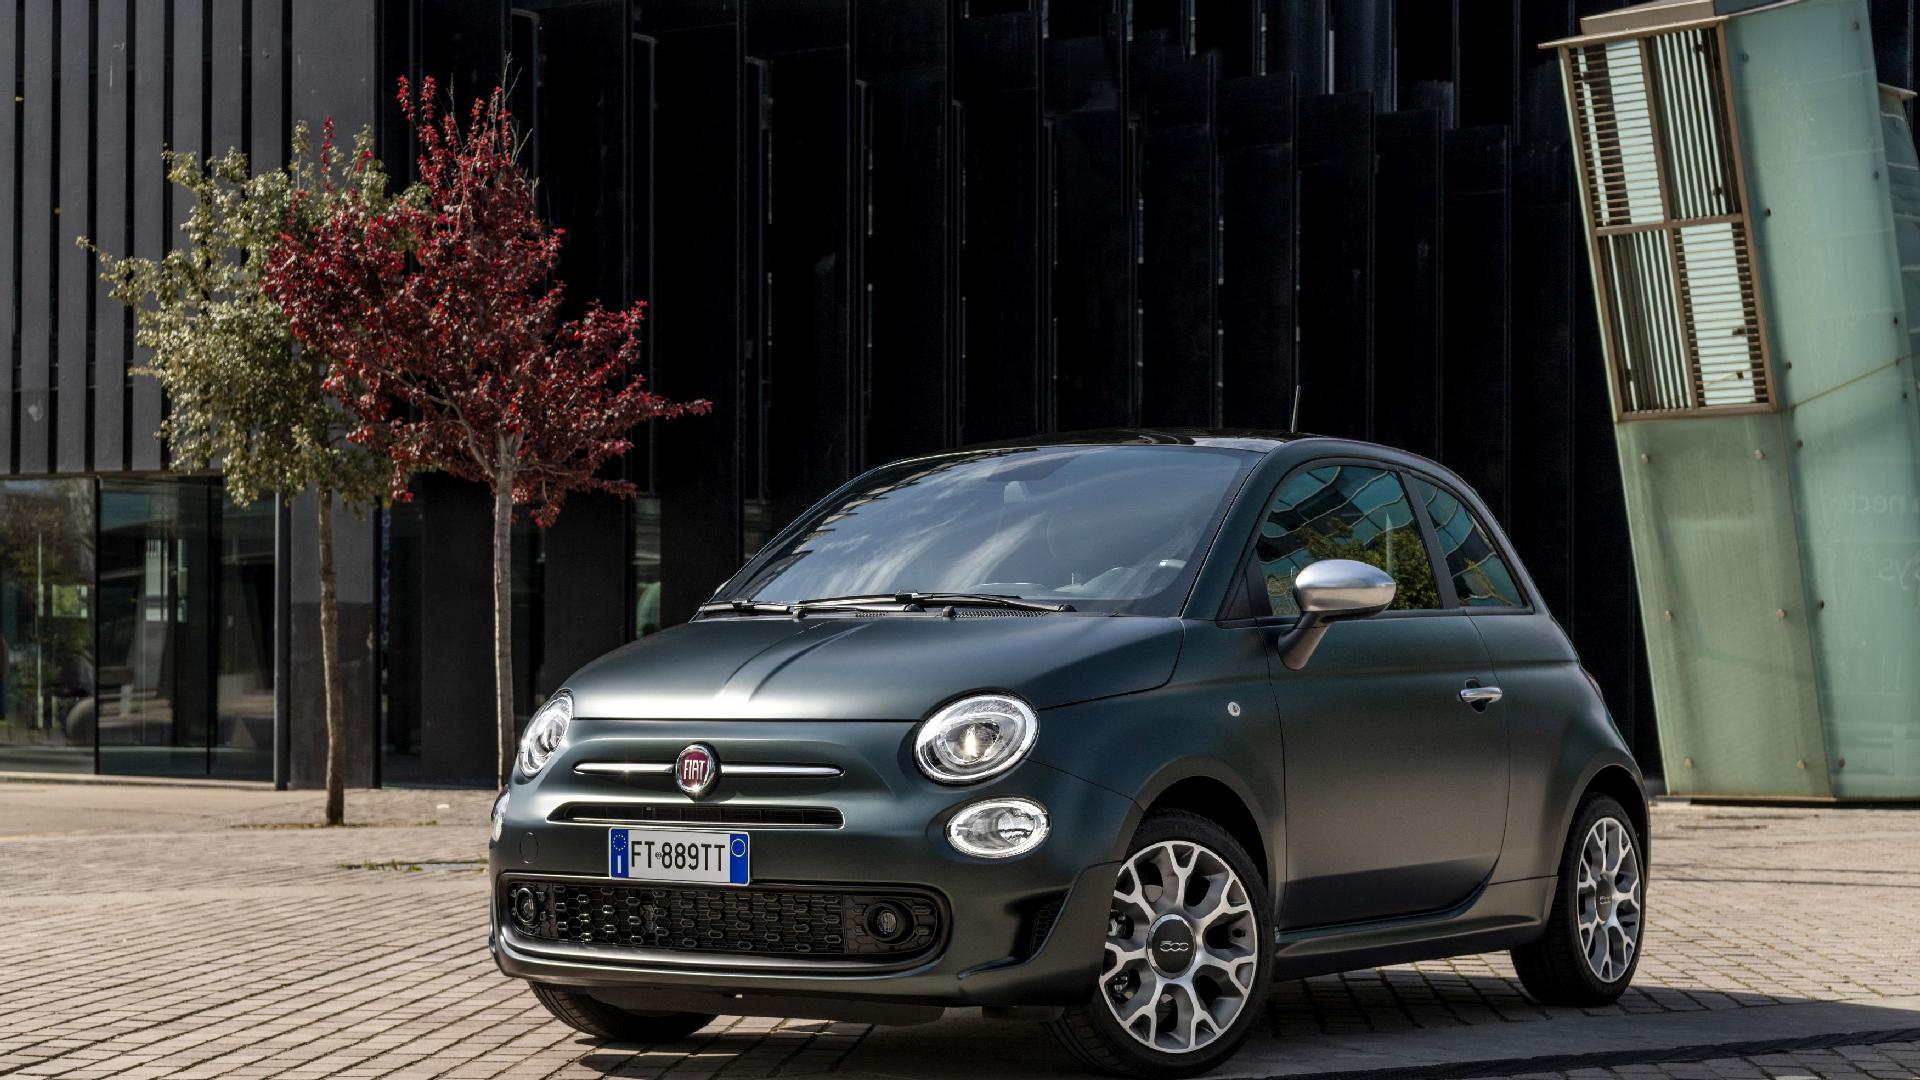 FIAT 500 1.2 Pop EU6d